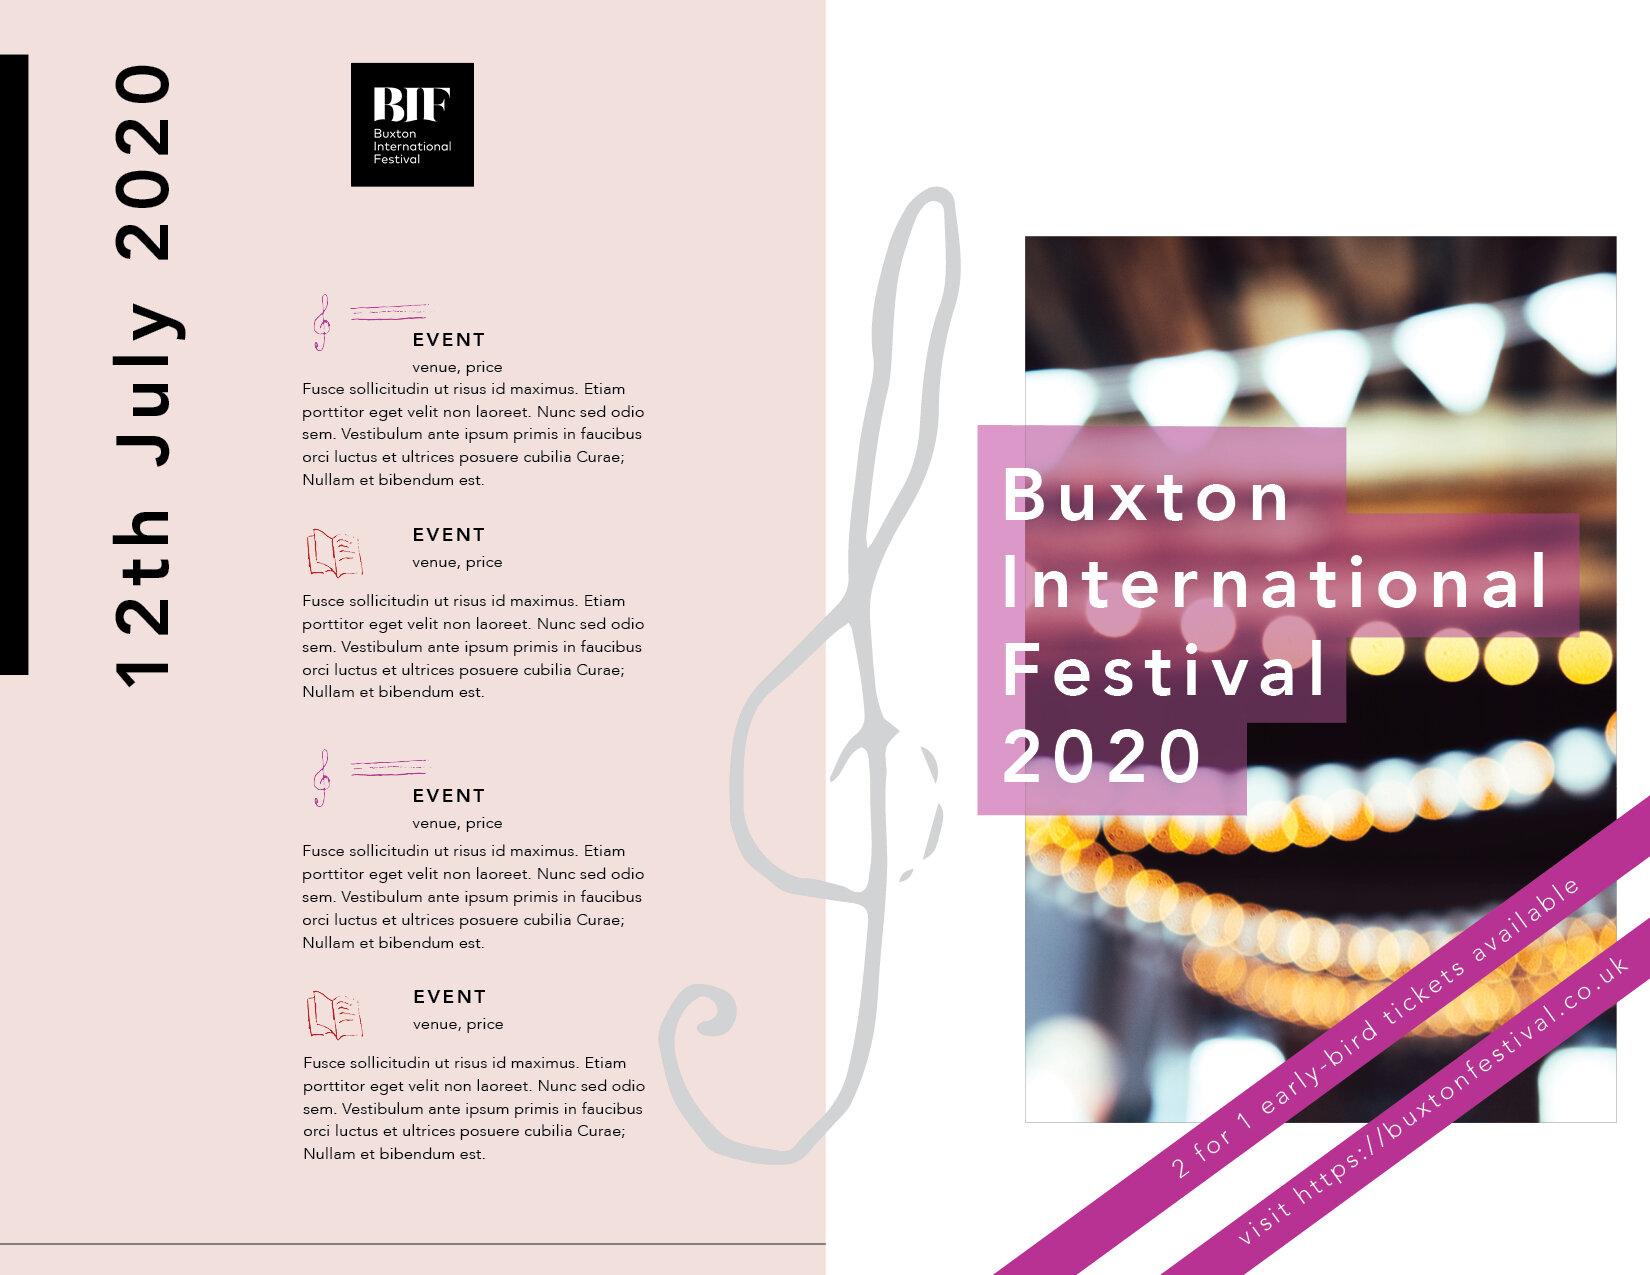 Buxton International Festival Proposal Lizzie Quirke v0.4.jpg